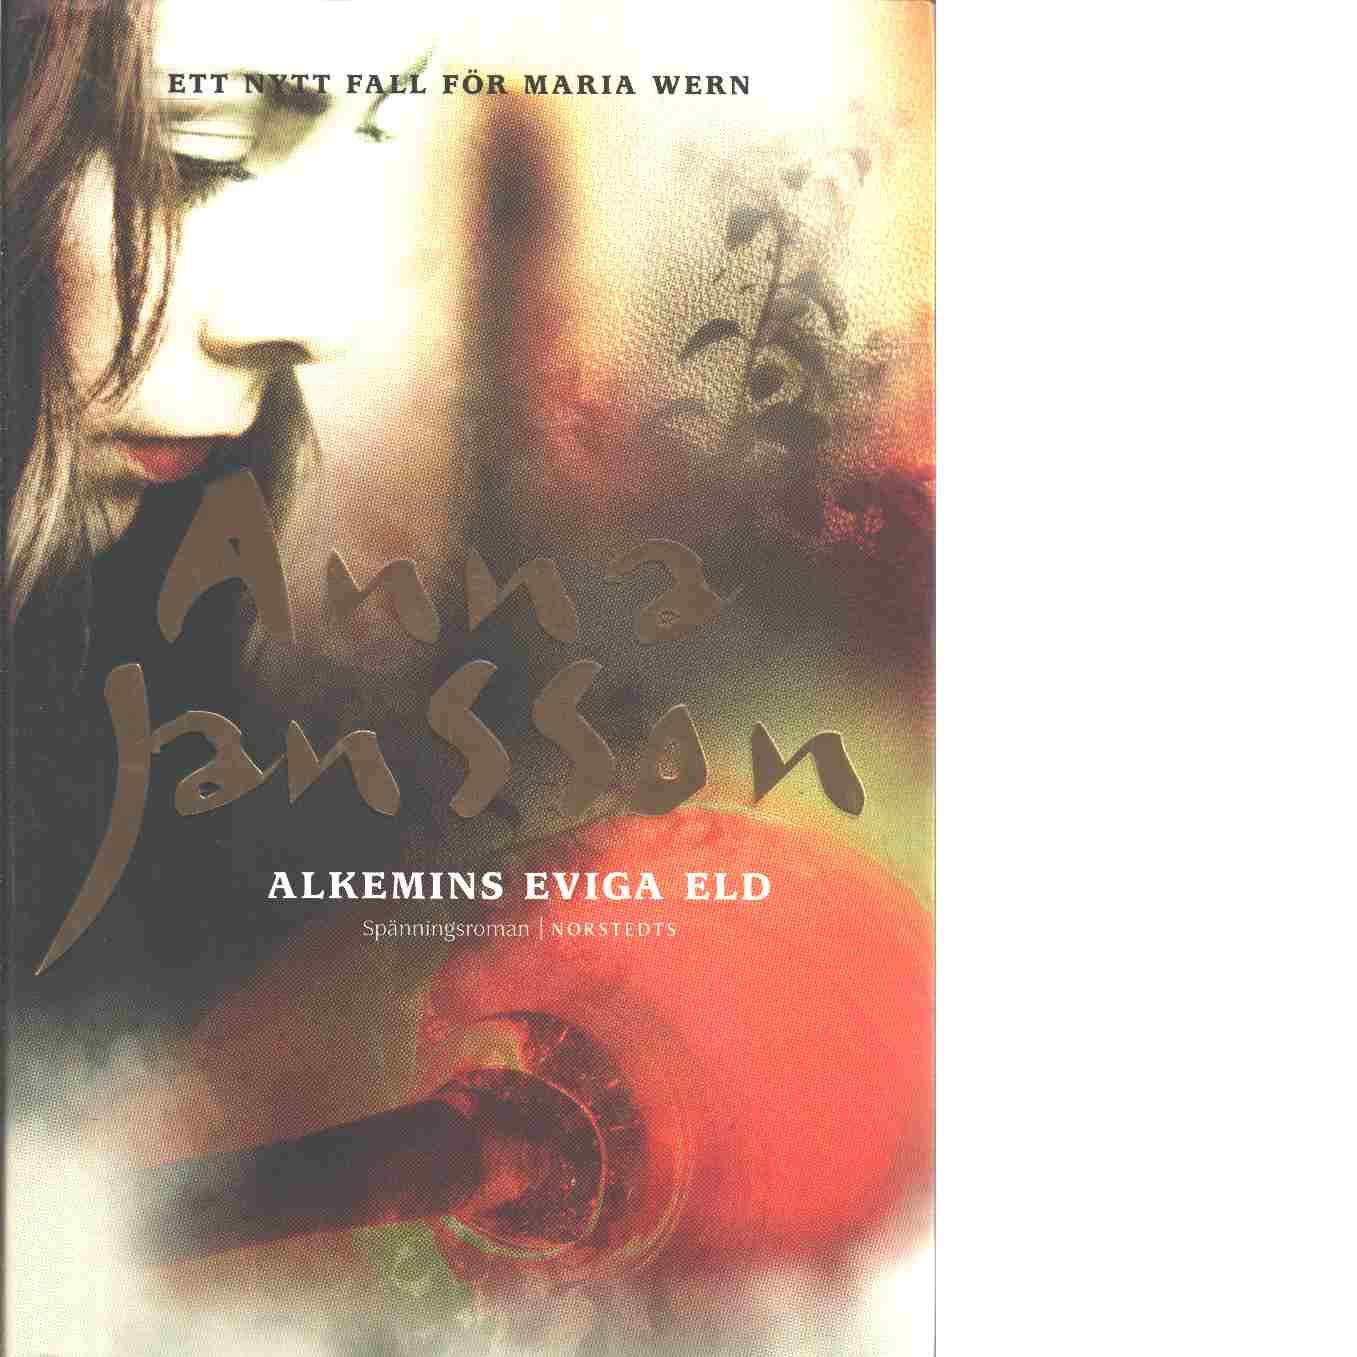 Alkemins eviga eld - Jansson, Anna